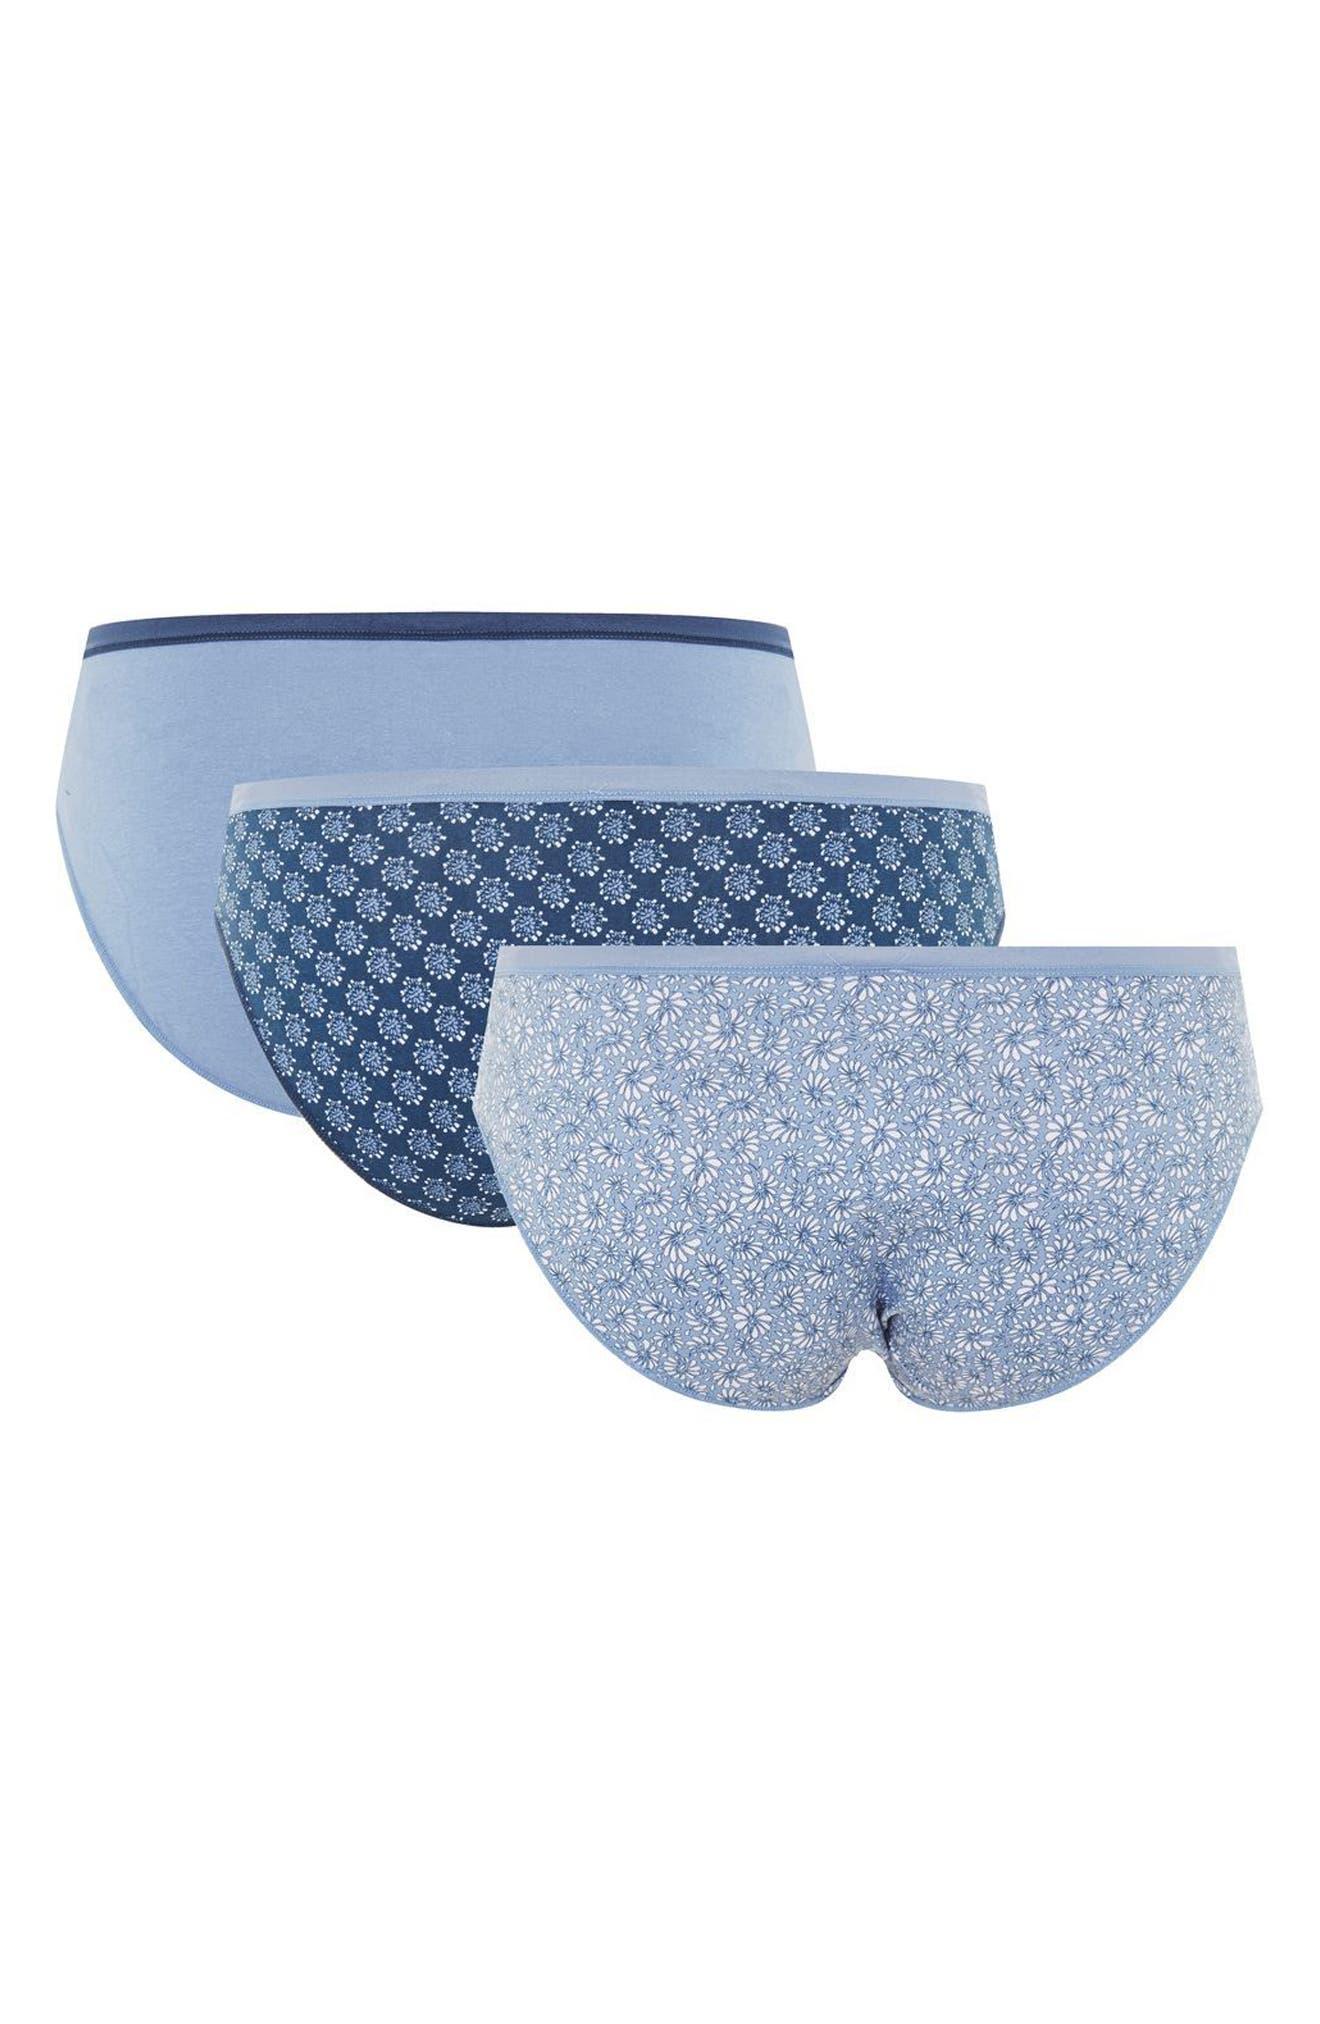 Set of 3 Panties,                             Alternate thumbnail 2, color,                             Blue Multi